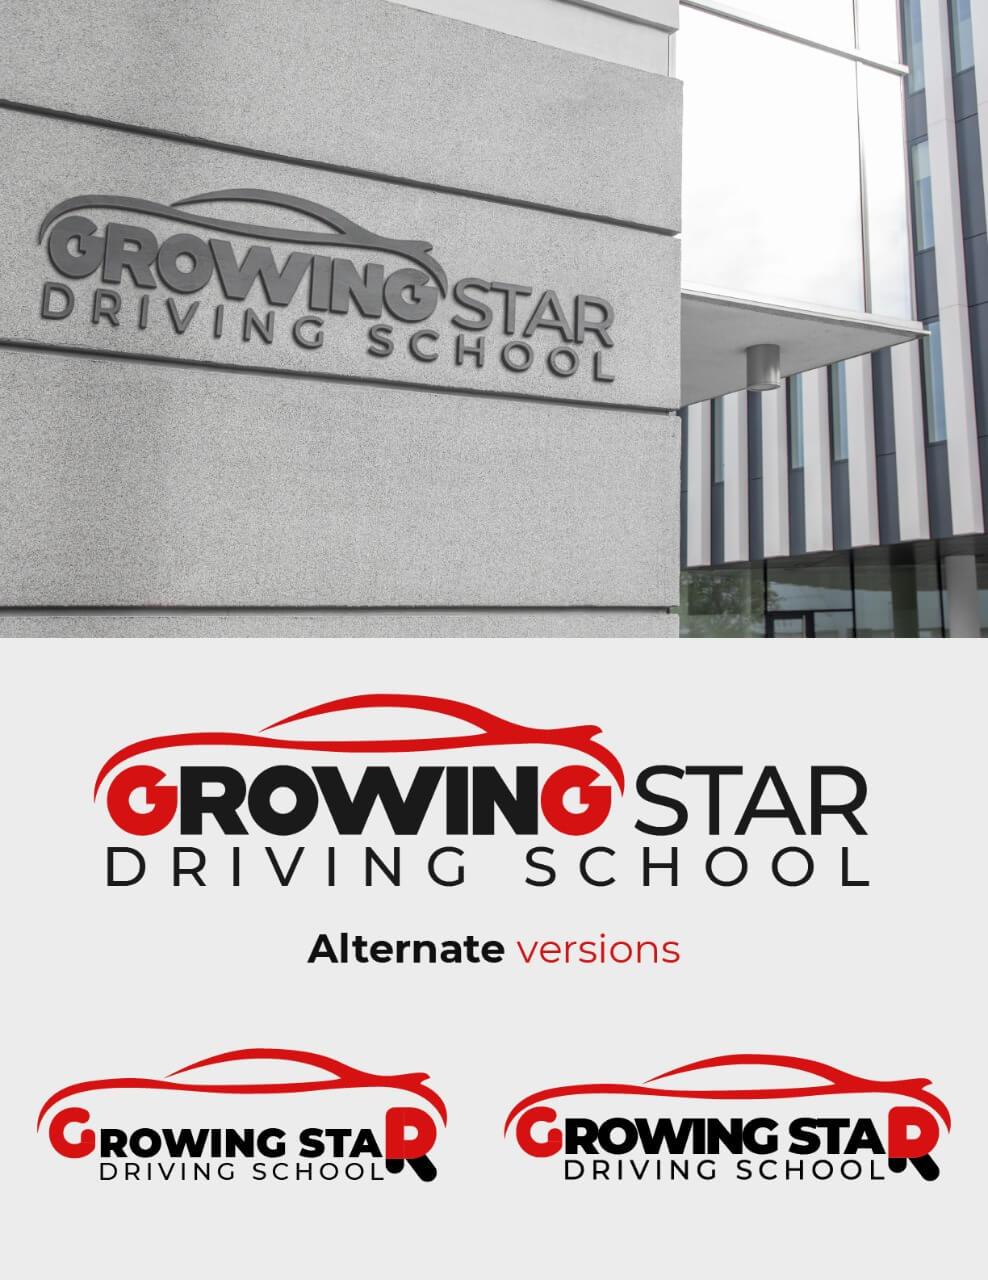 Growing Star Driving School Mockup